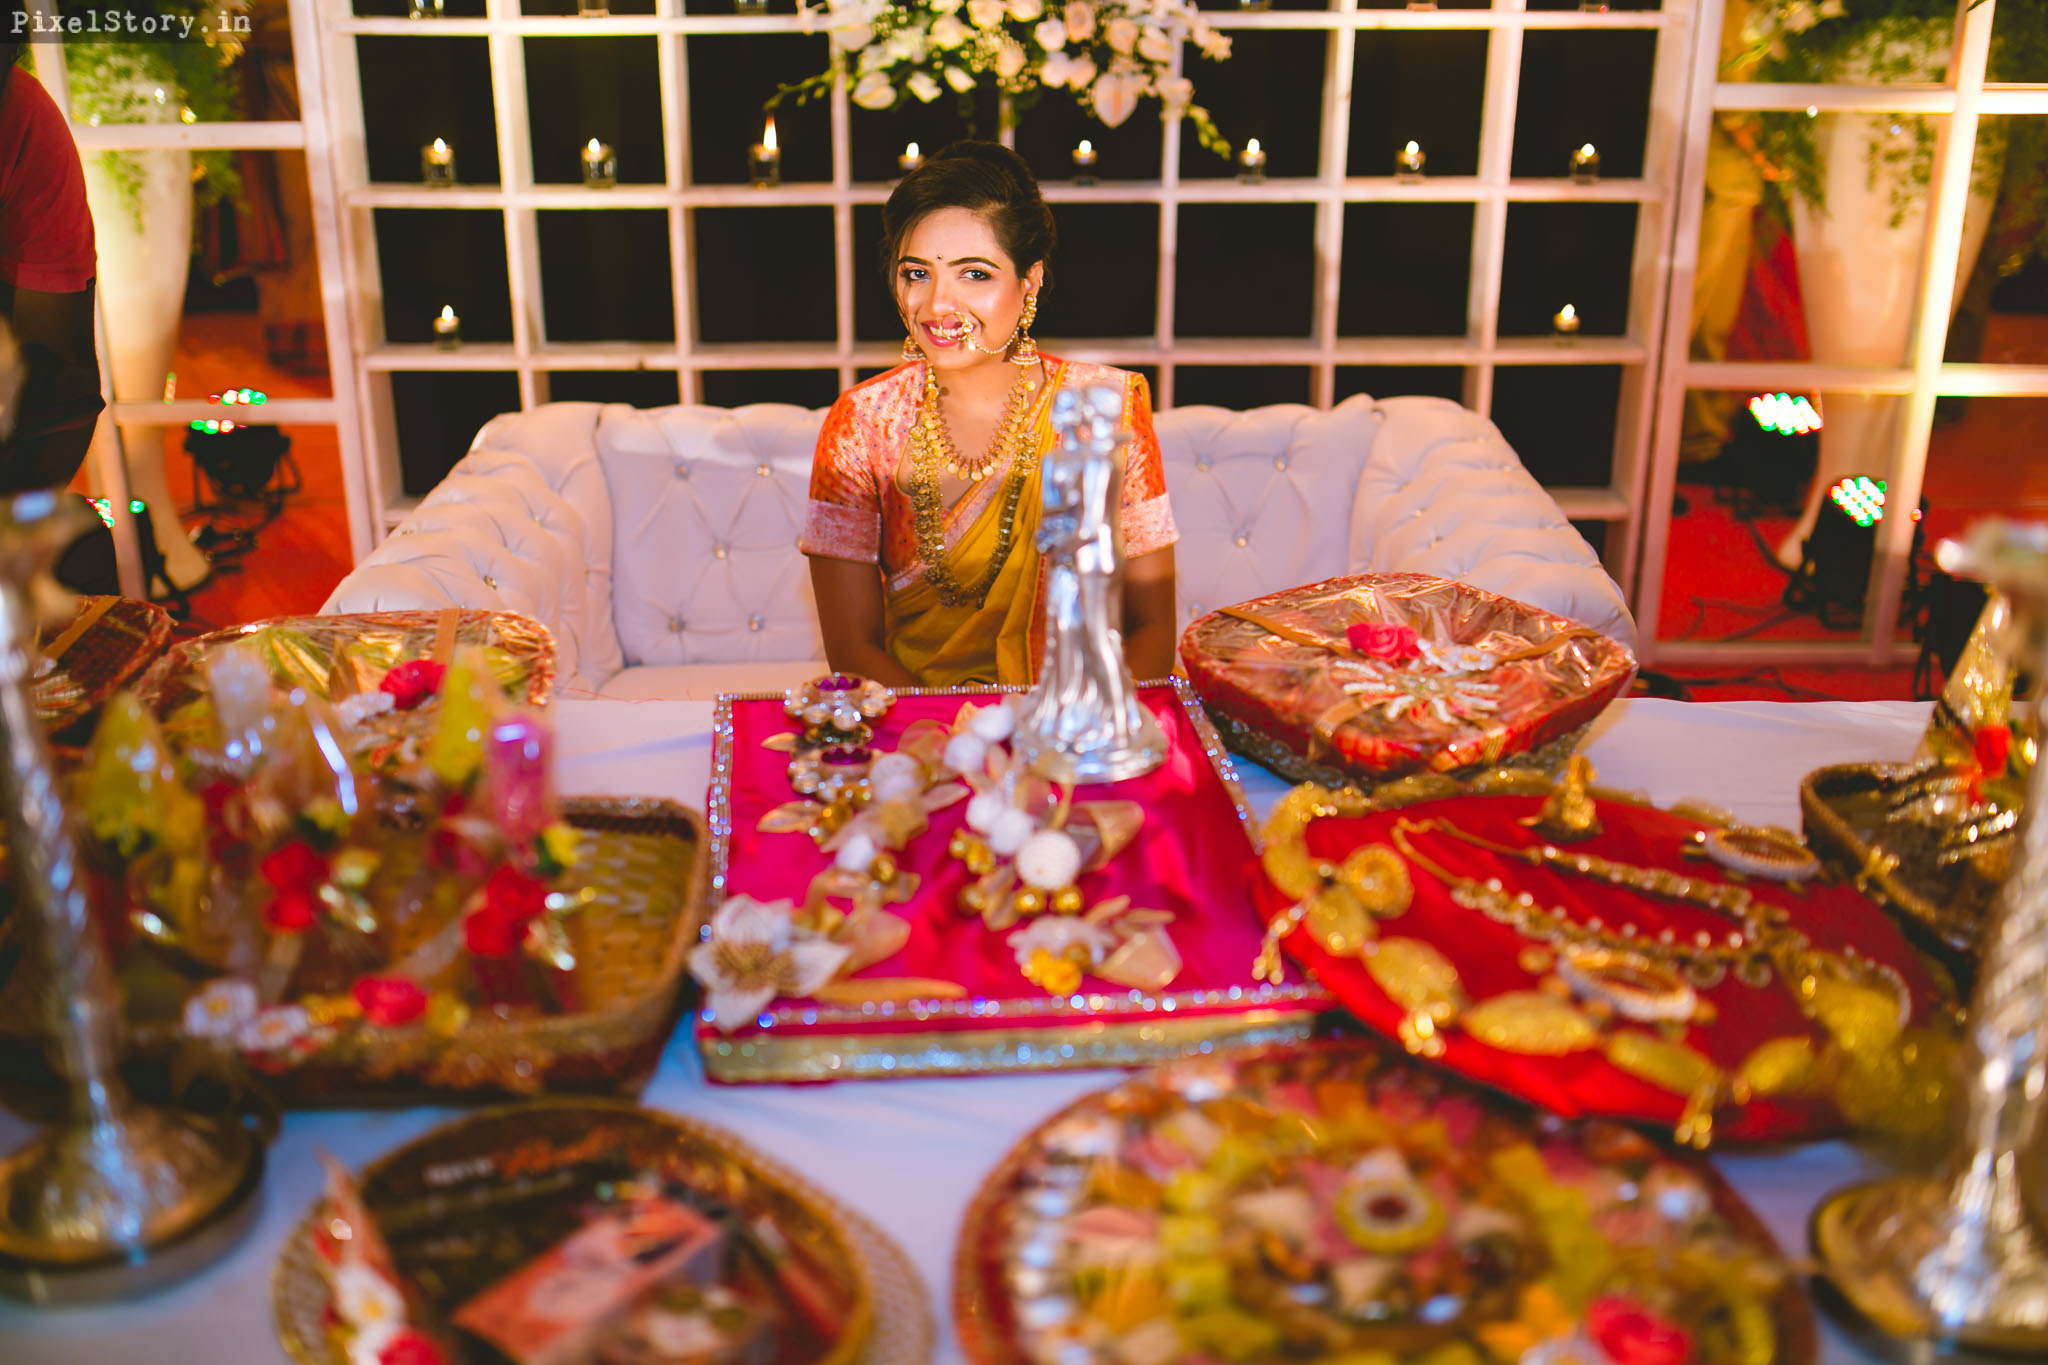 PixelStory-Engagement-Ritz-Carlton-Preksha-Bharath-008.jpg